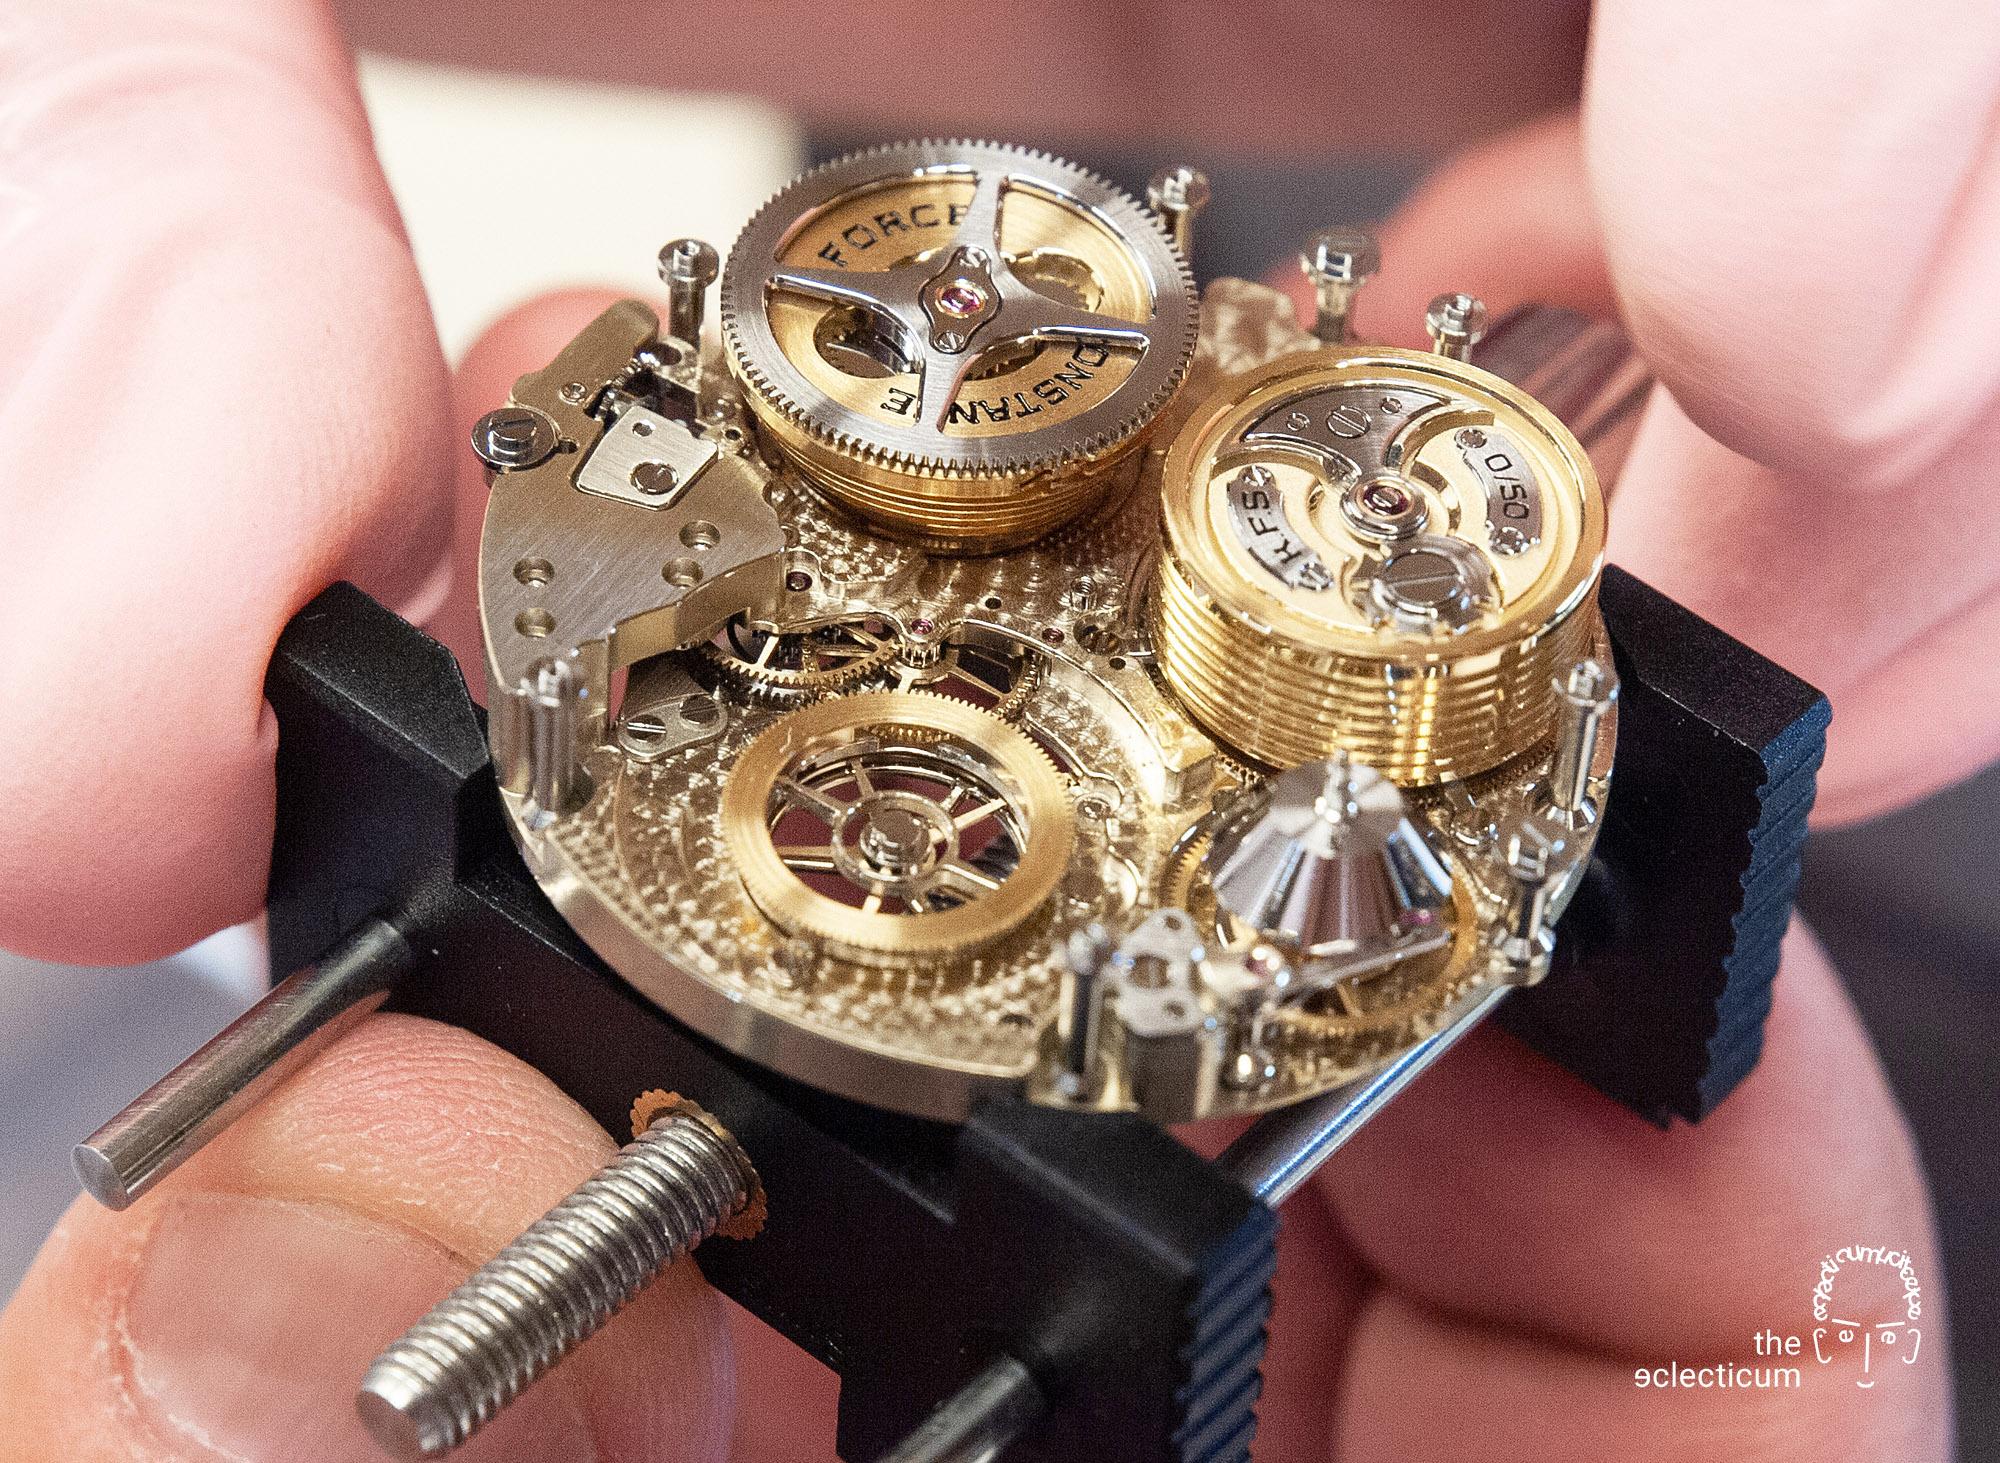 Ferdinand Berthoud Chronometry FB 1R 1L 1 chronometer tourbillon assembly watchmaking movement